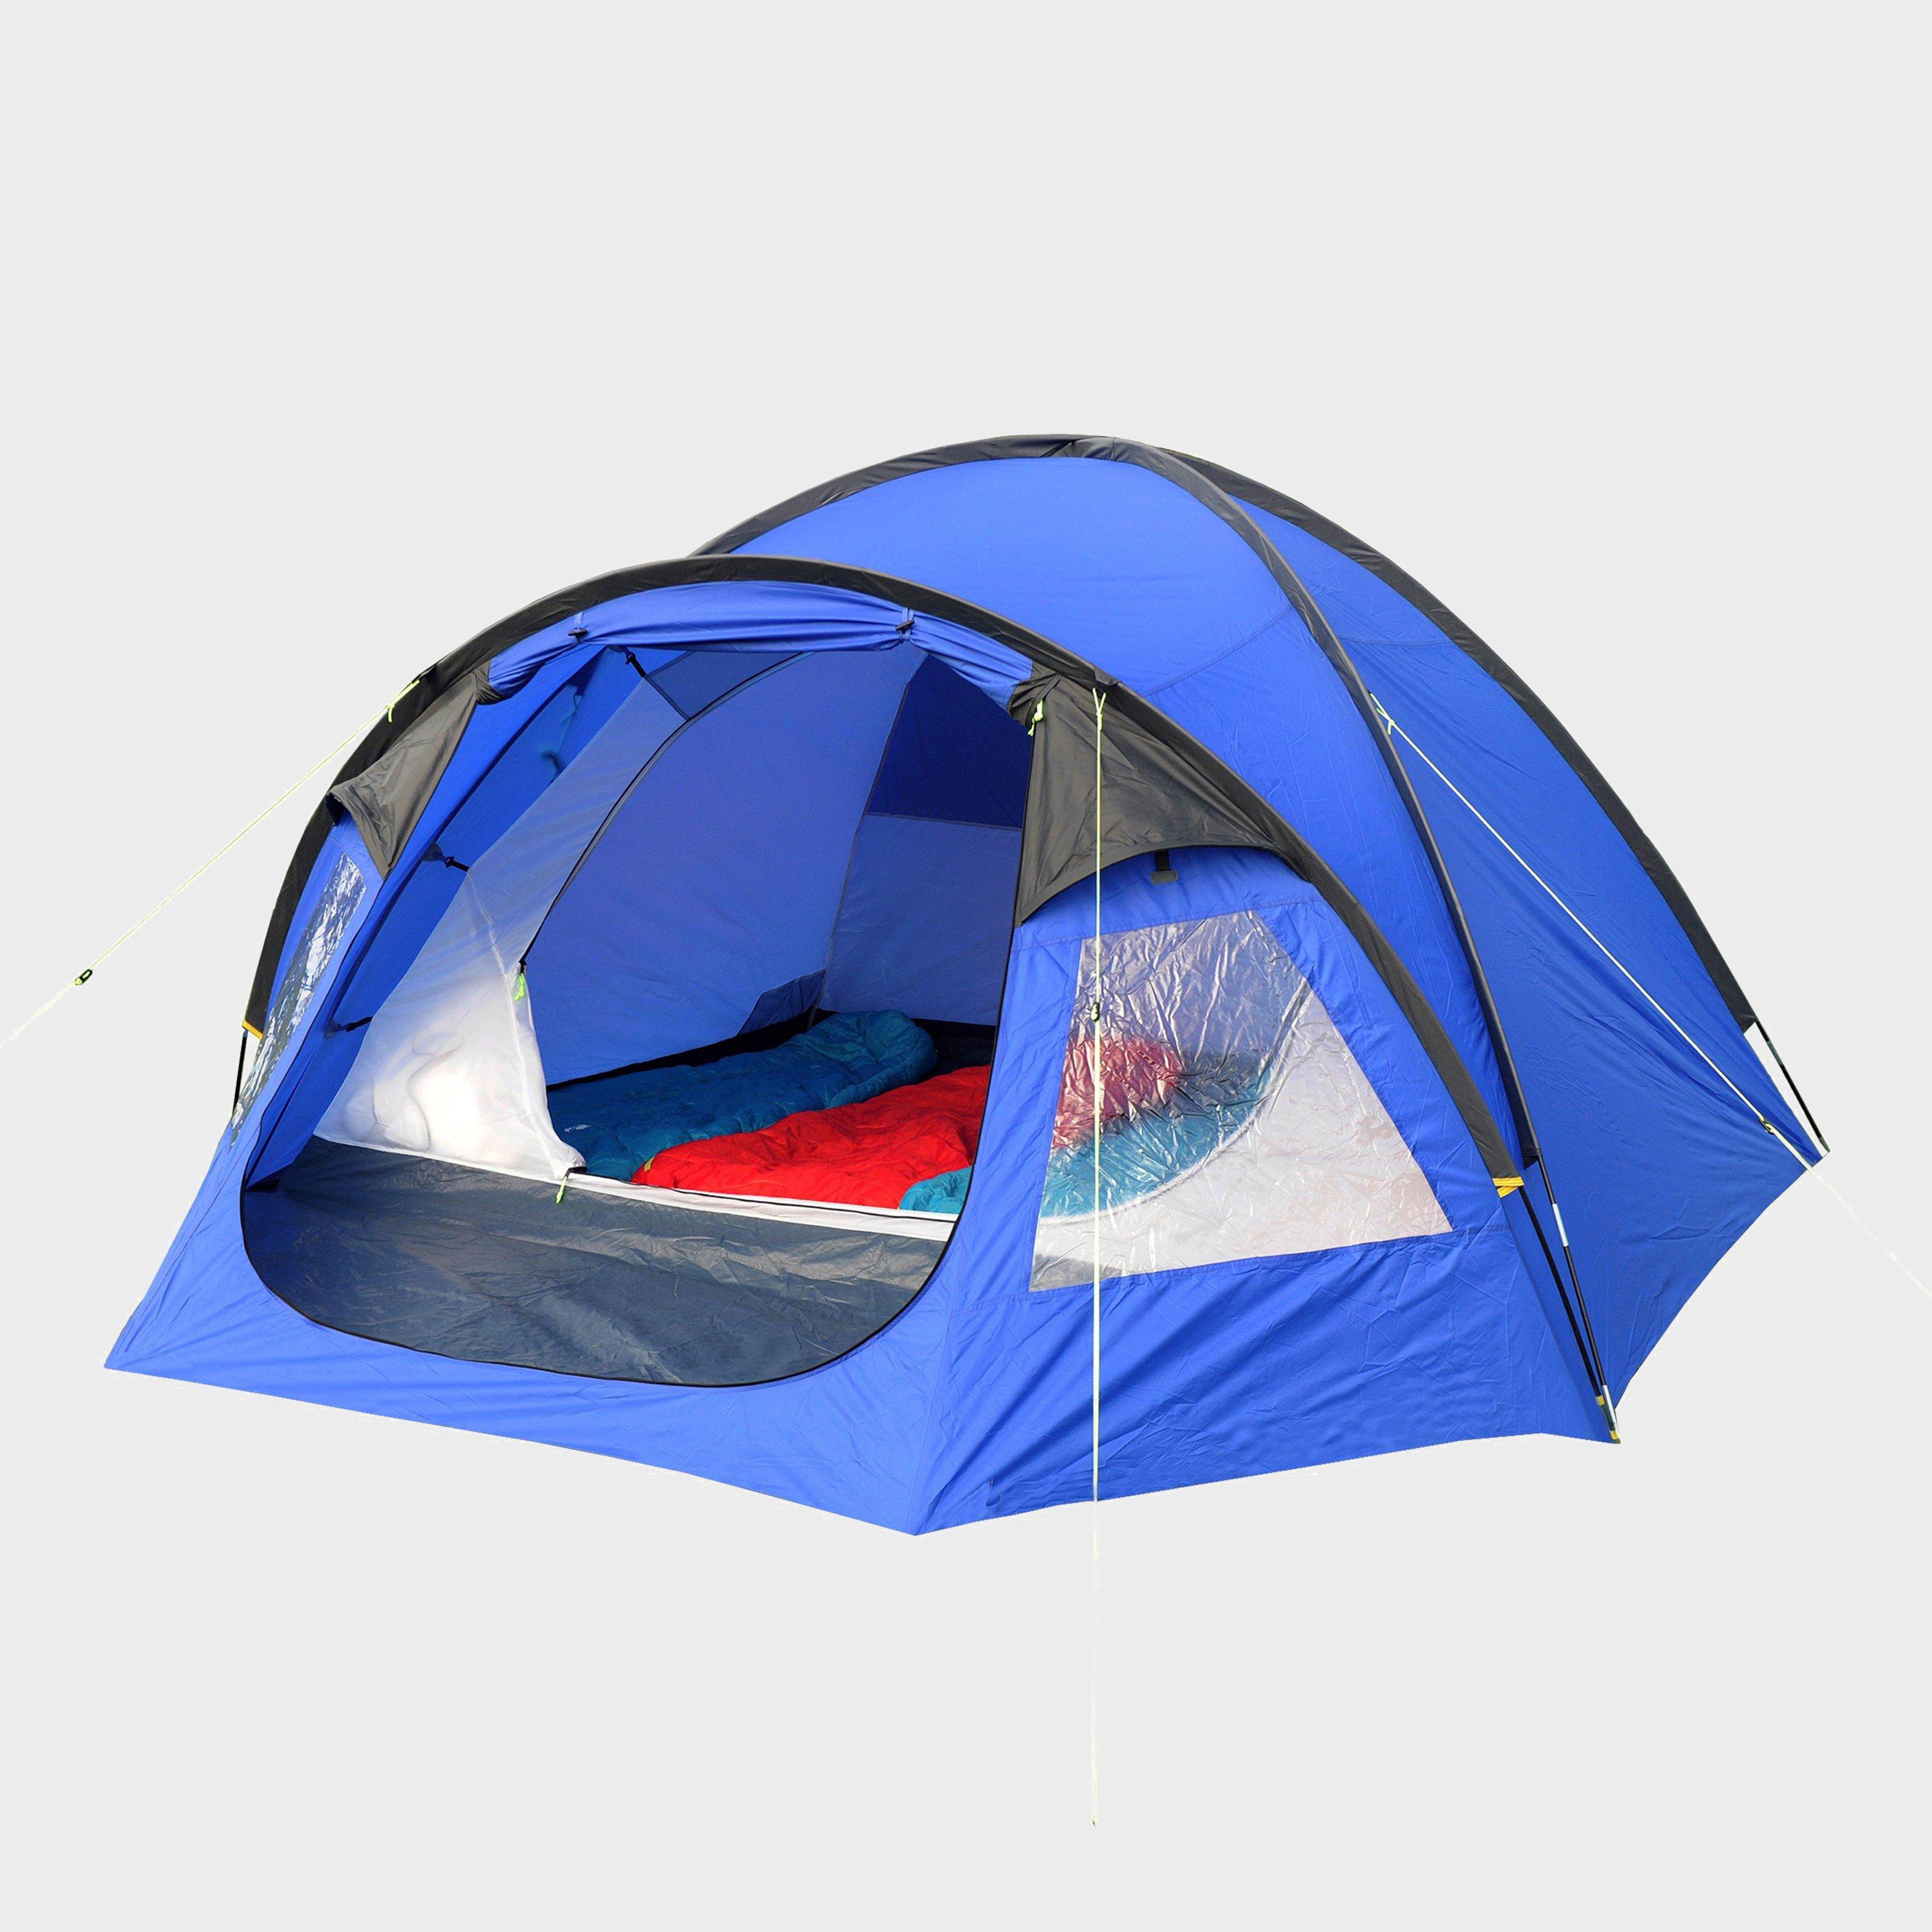 Cairns 4 Deluxe Tent  sc 1 st  Millets & 4 u0026 5 Man Tents | 4 u0026 5 Person Family Tents | Millets